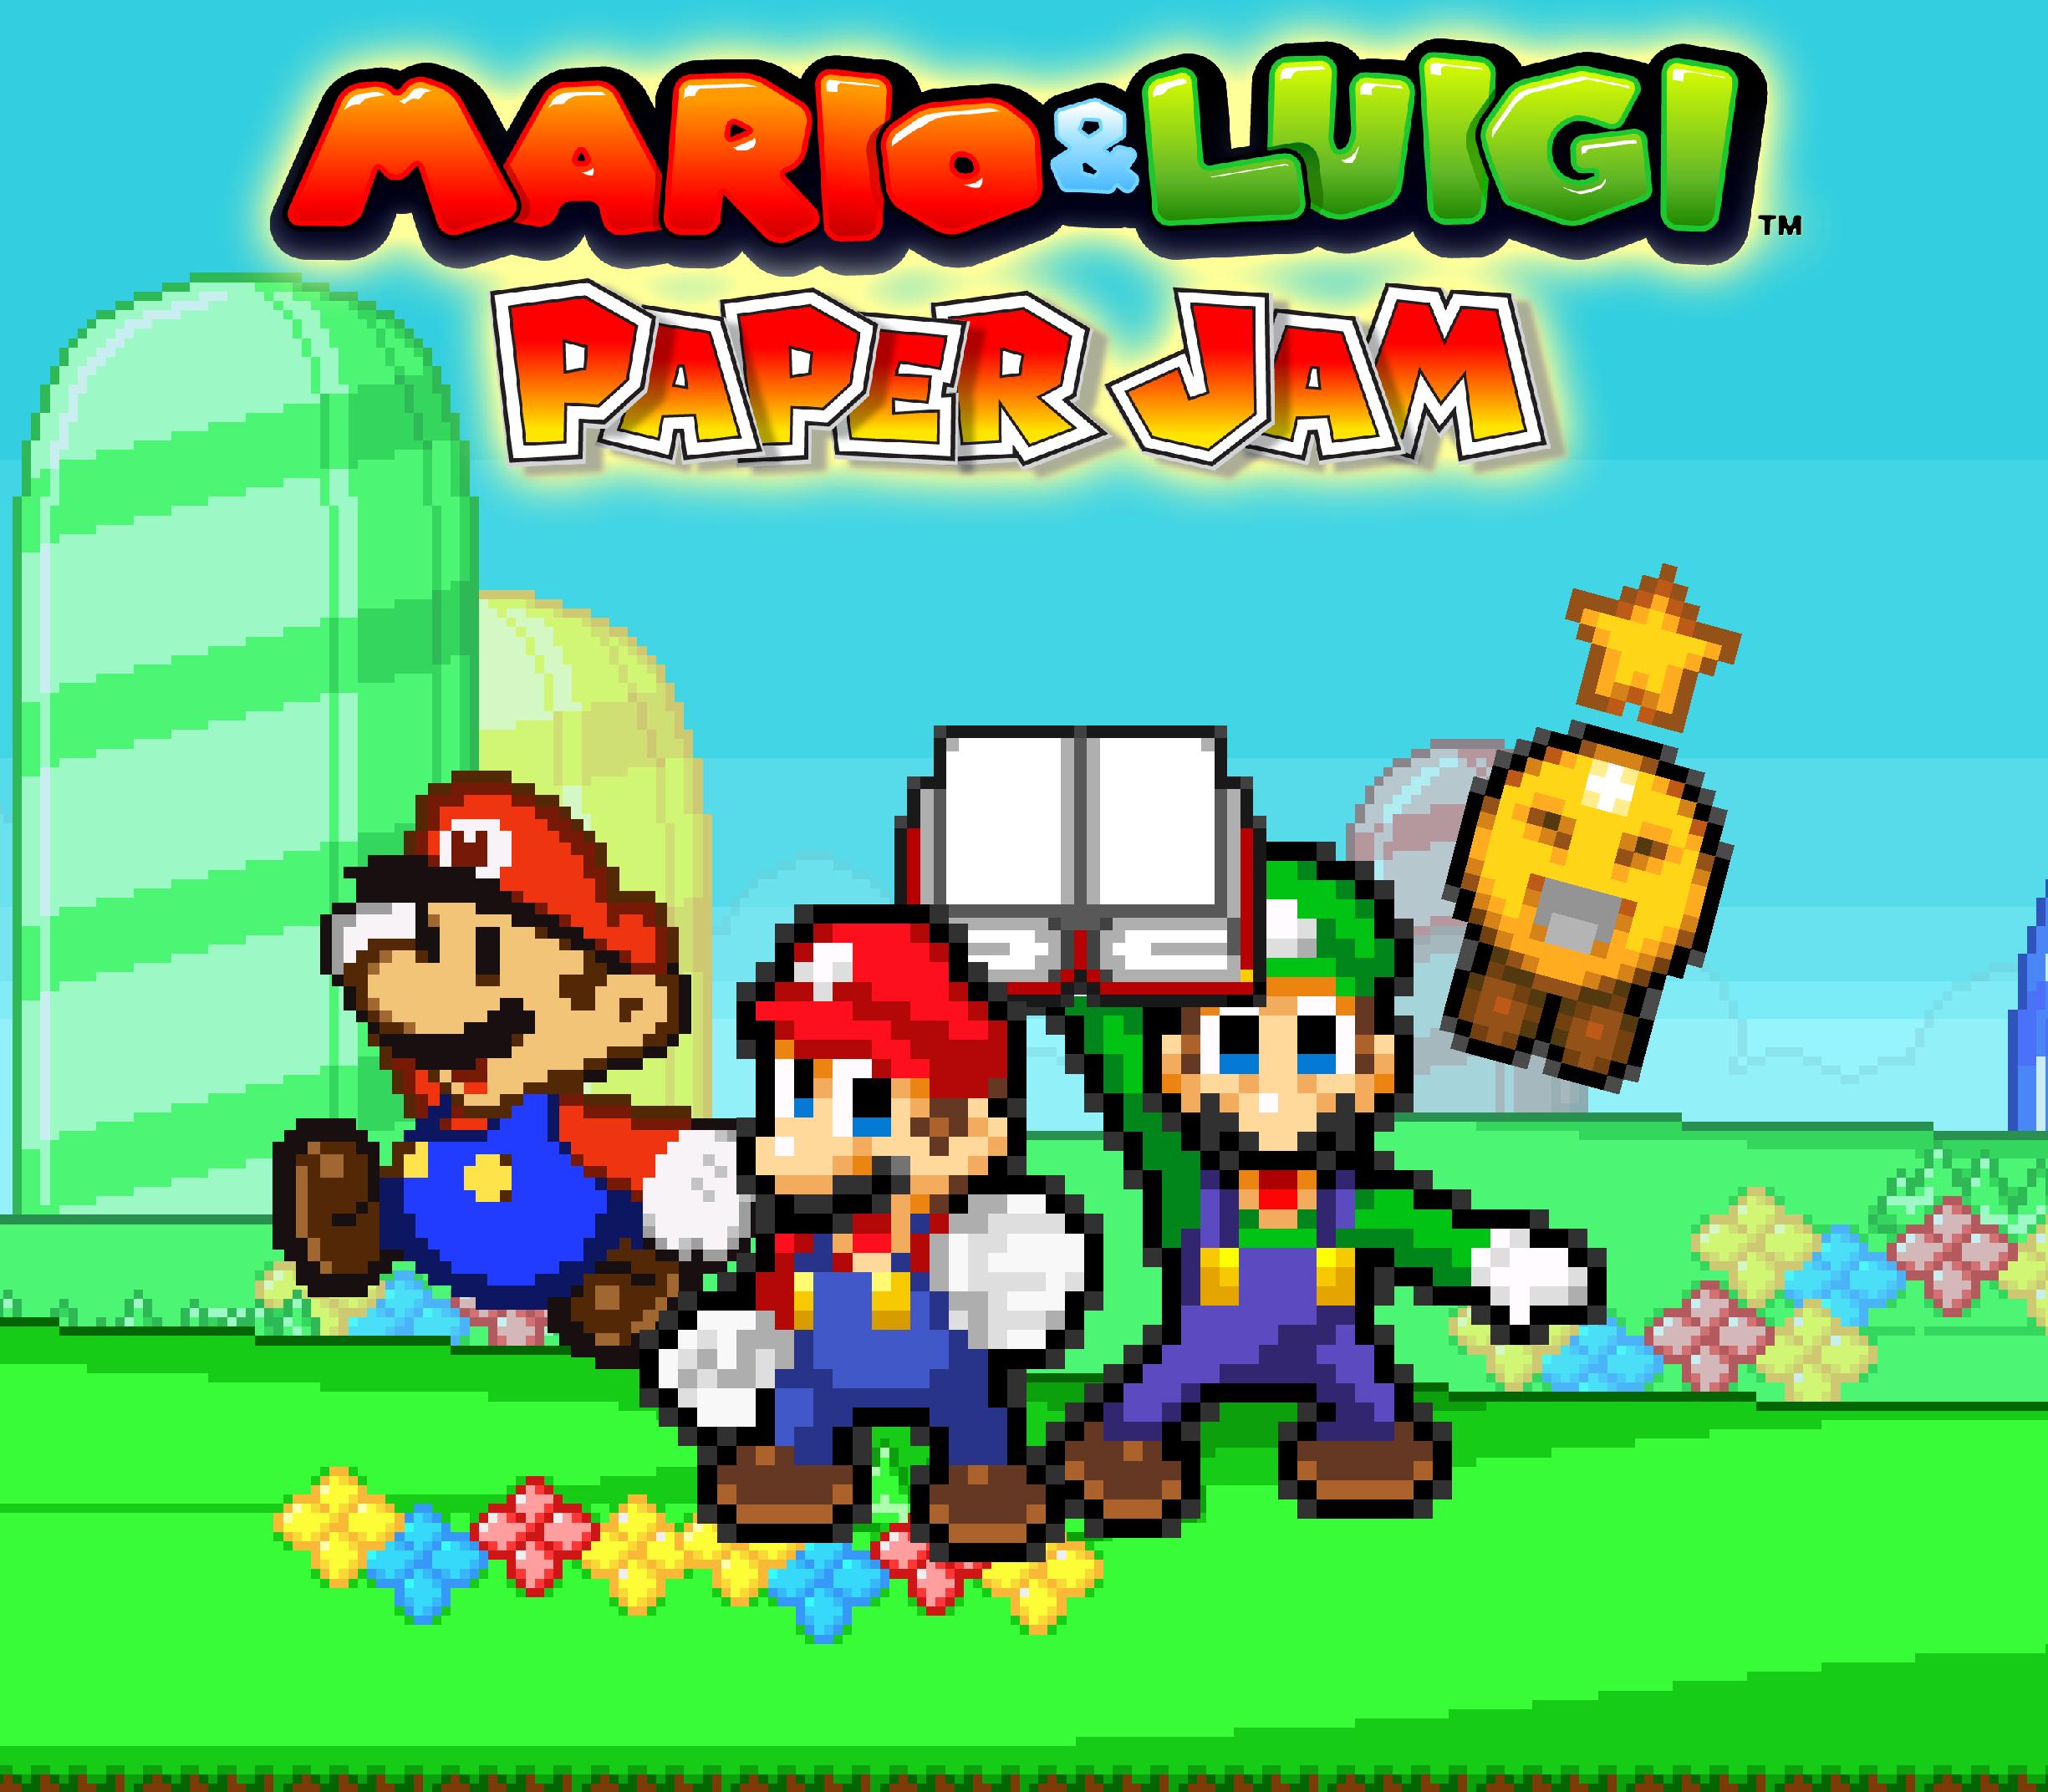 Mario And Luigi Paper Jam Poster My Version By Asylusgoji91 On